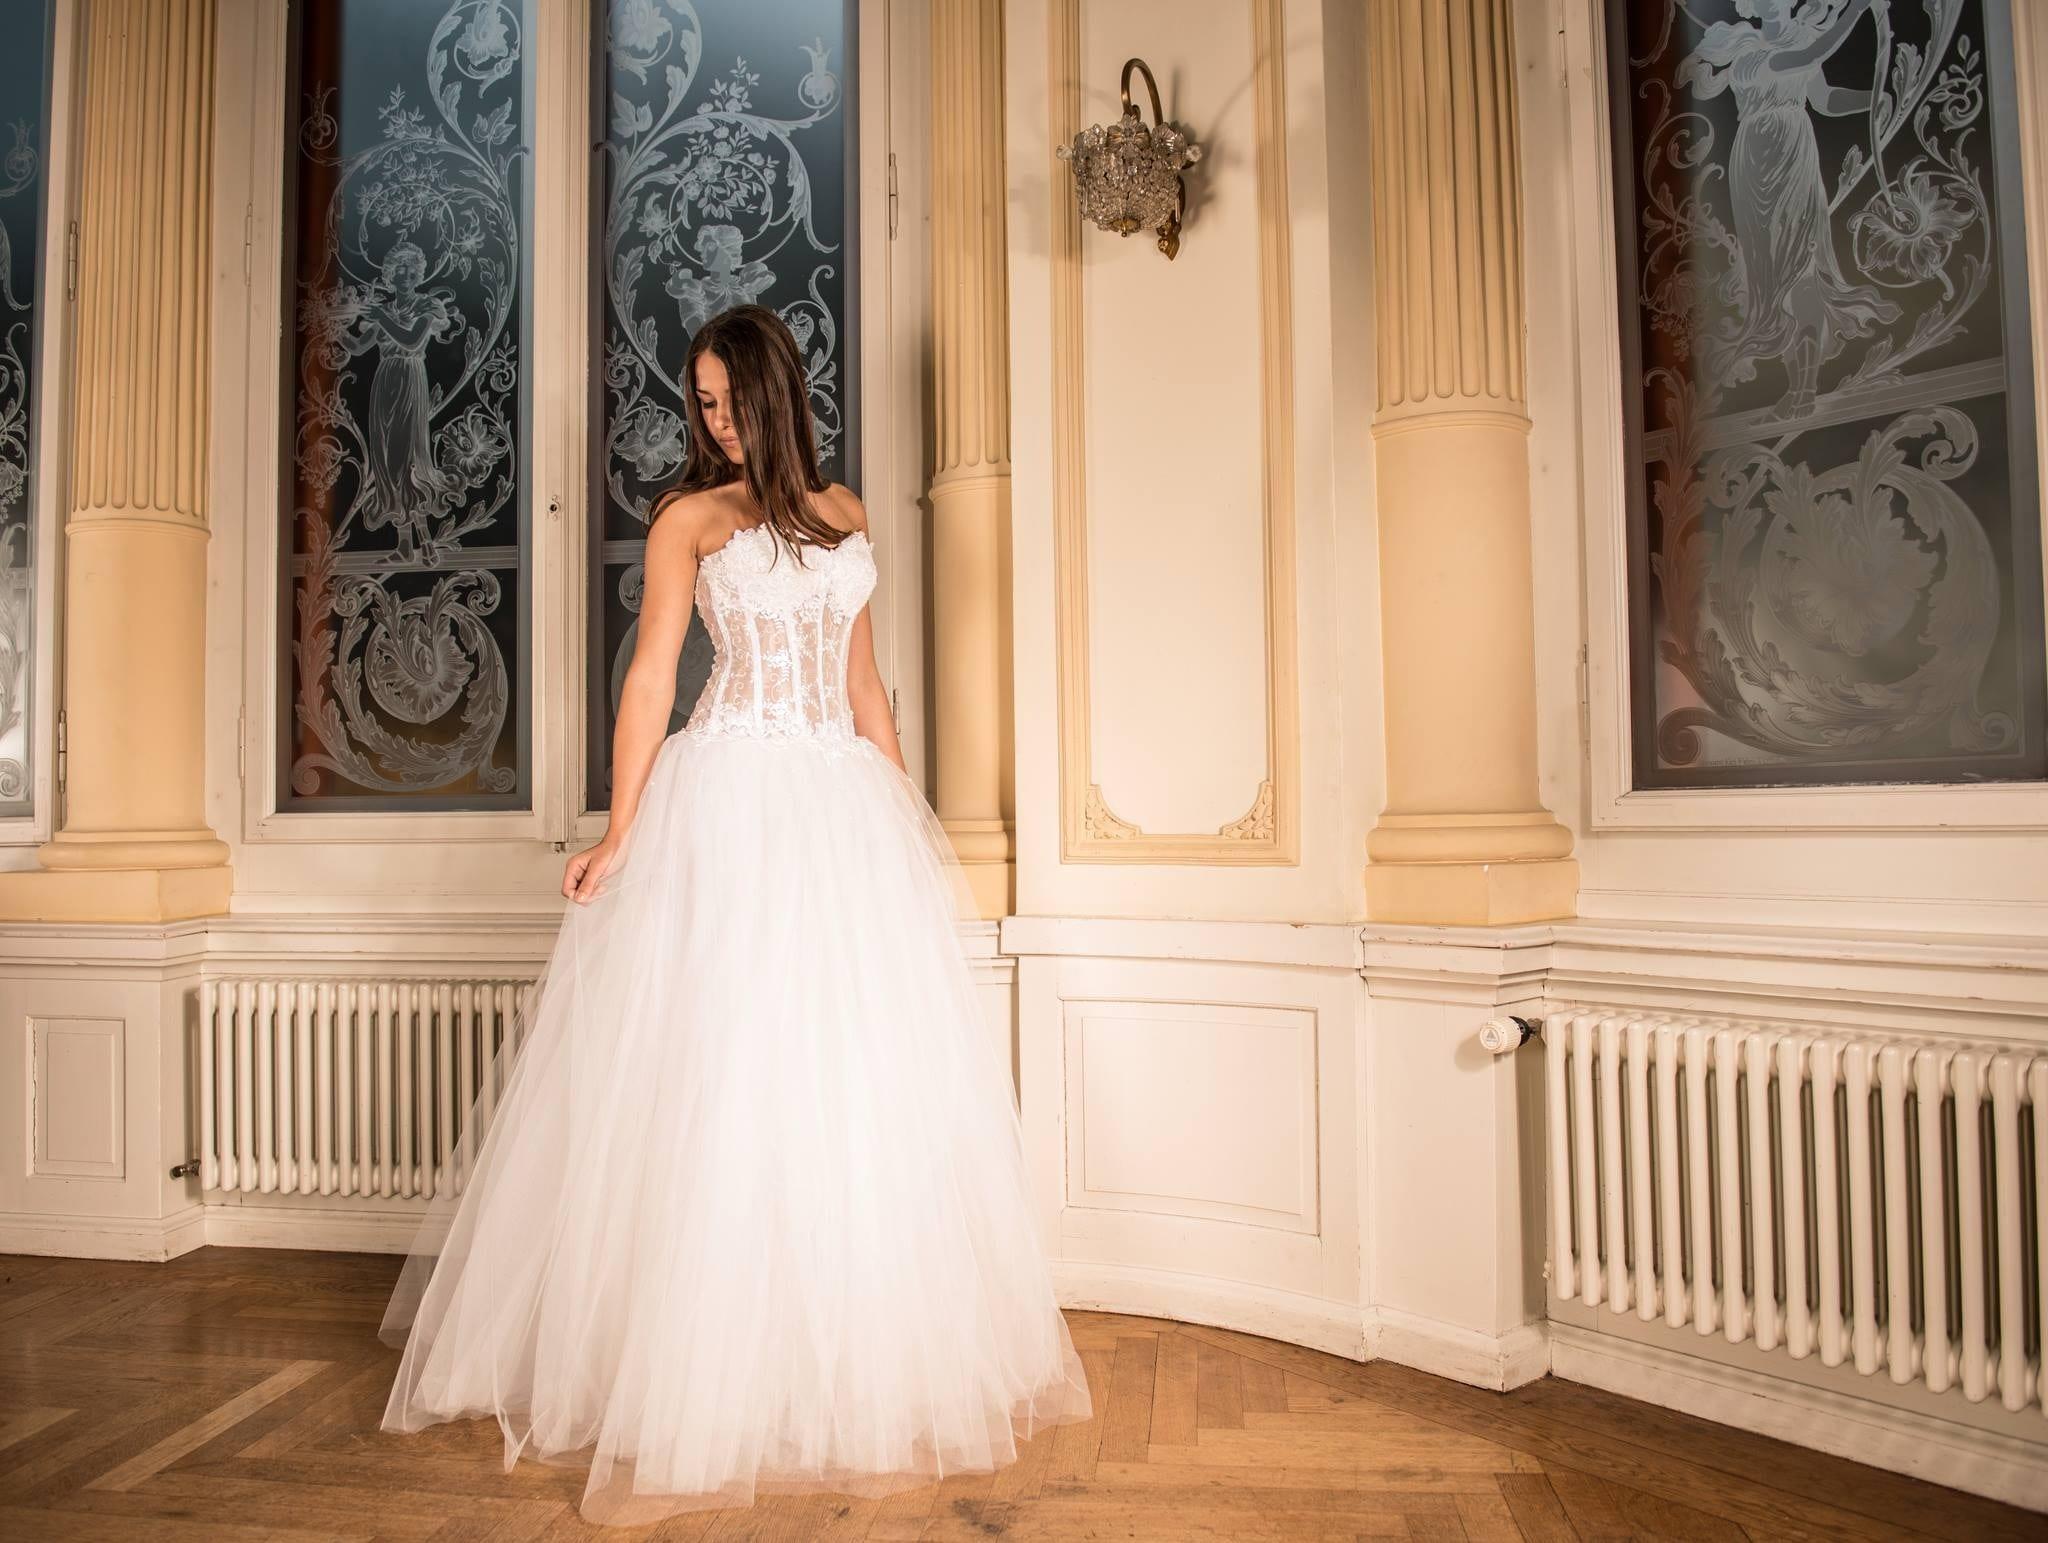 Femme regardant sa robe - Mariage-Perpignan - Robe Perpignan